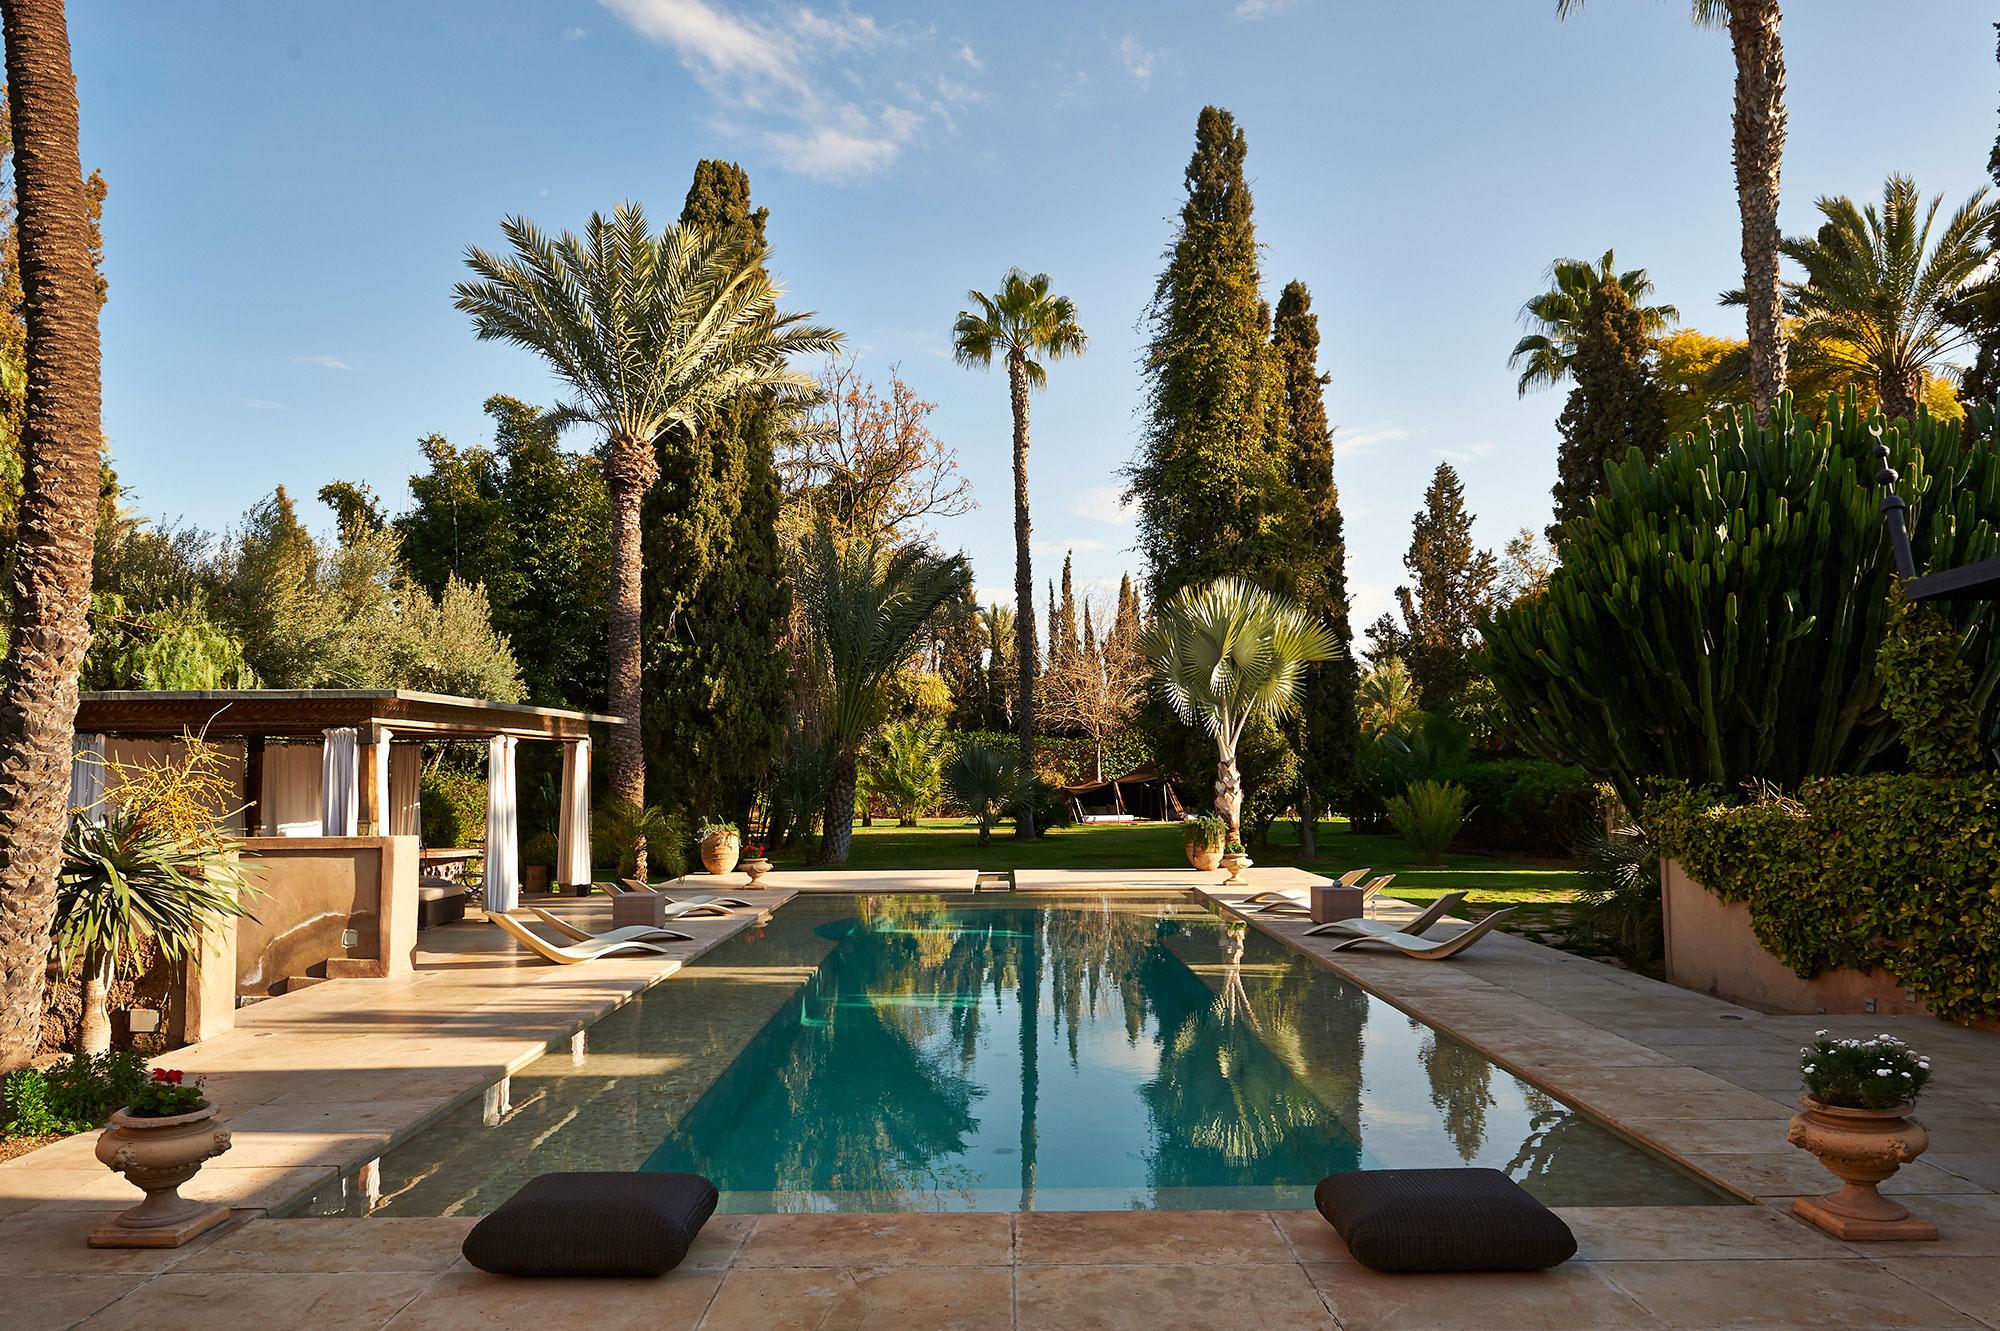 Dar JL Hotel Marrakech Morocco 29